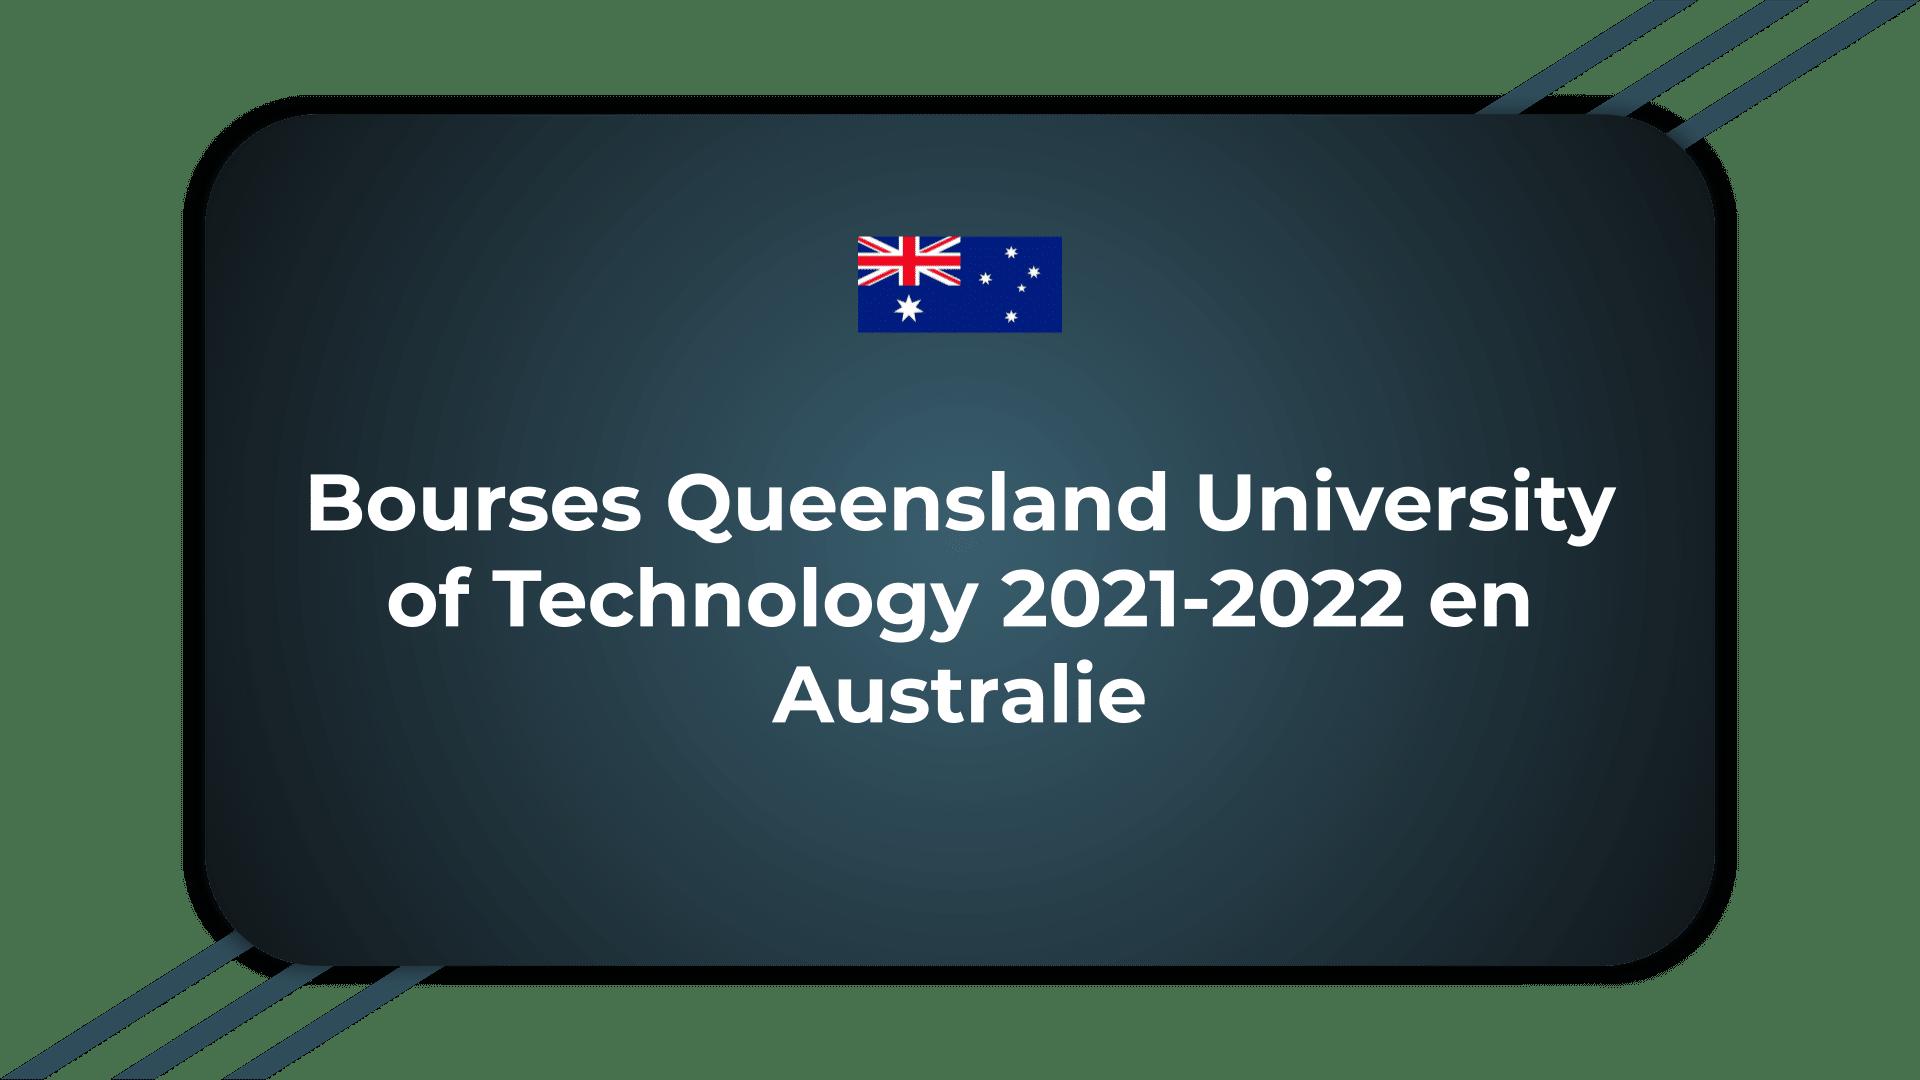 Bourses Queensland University of Technology